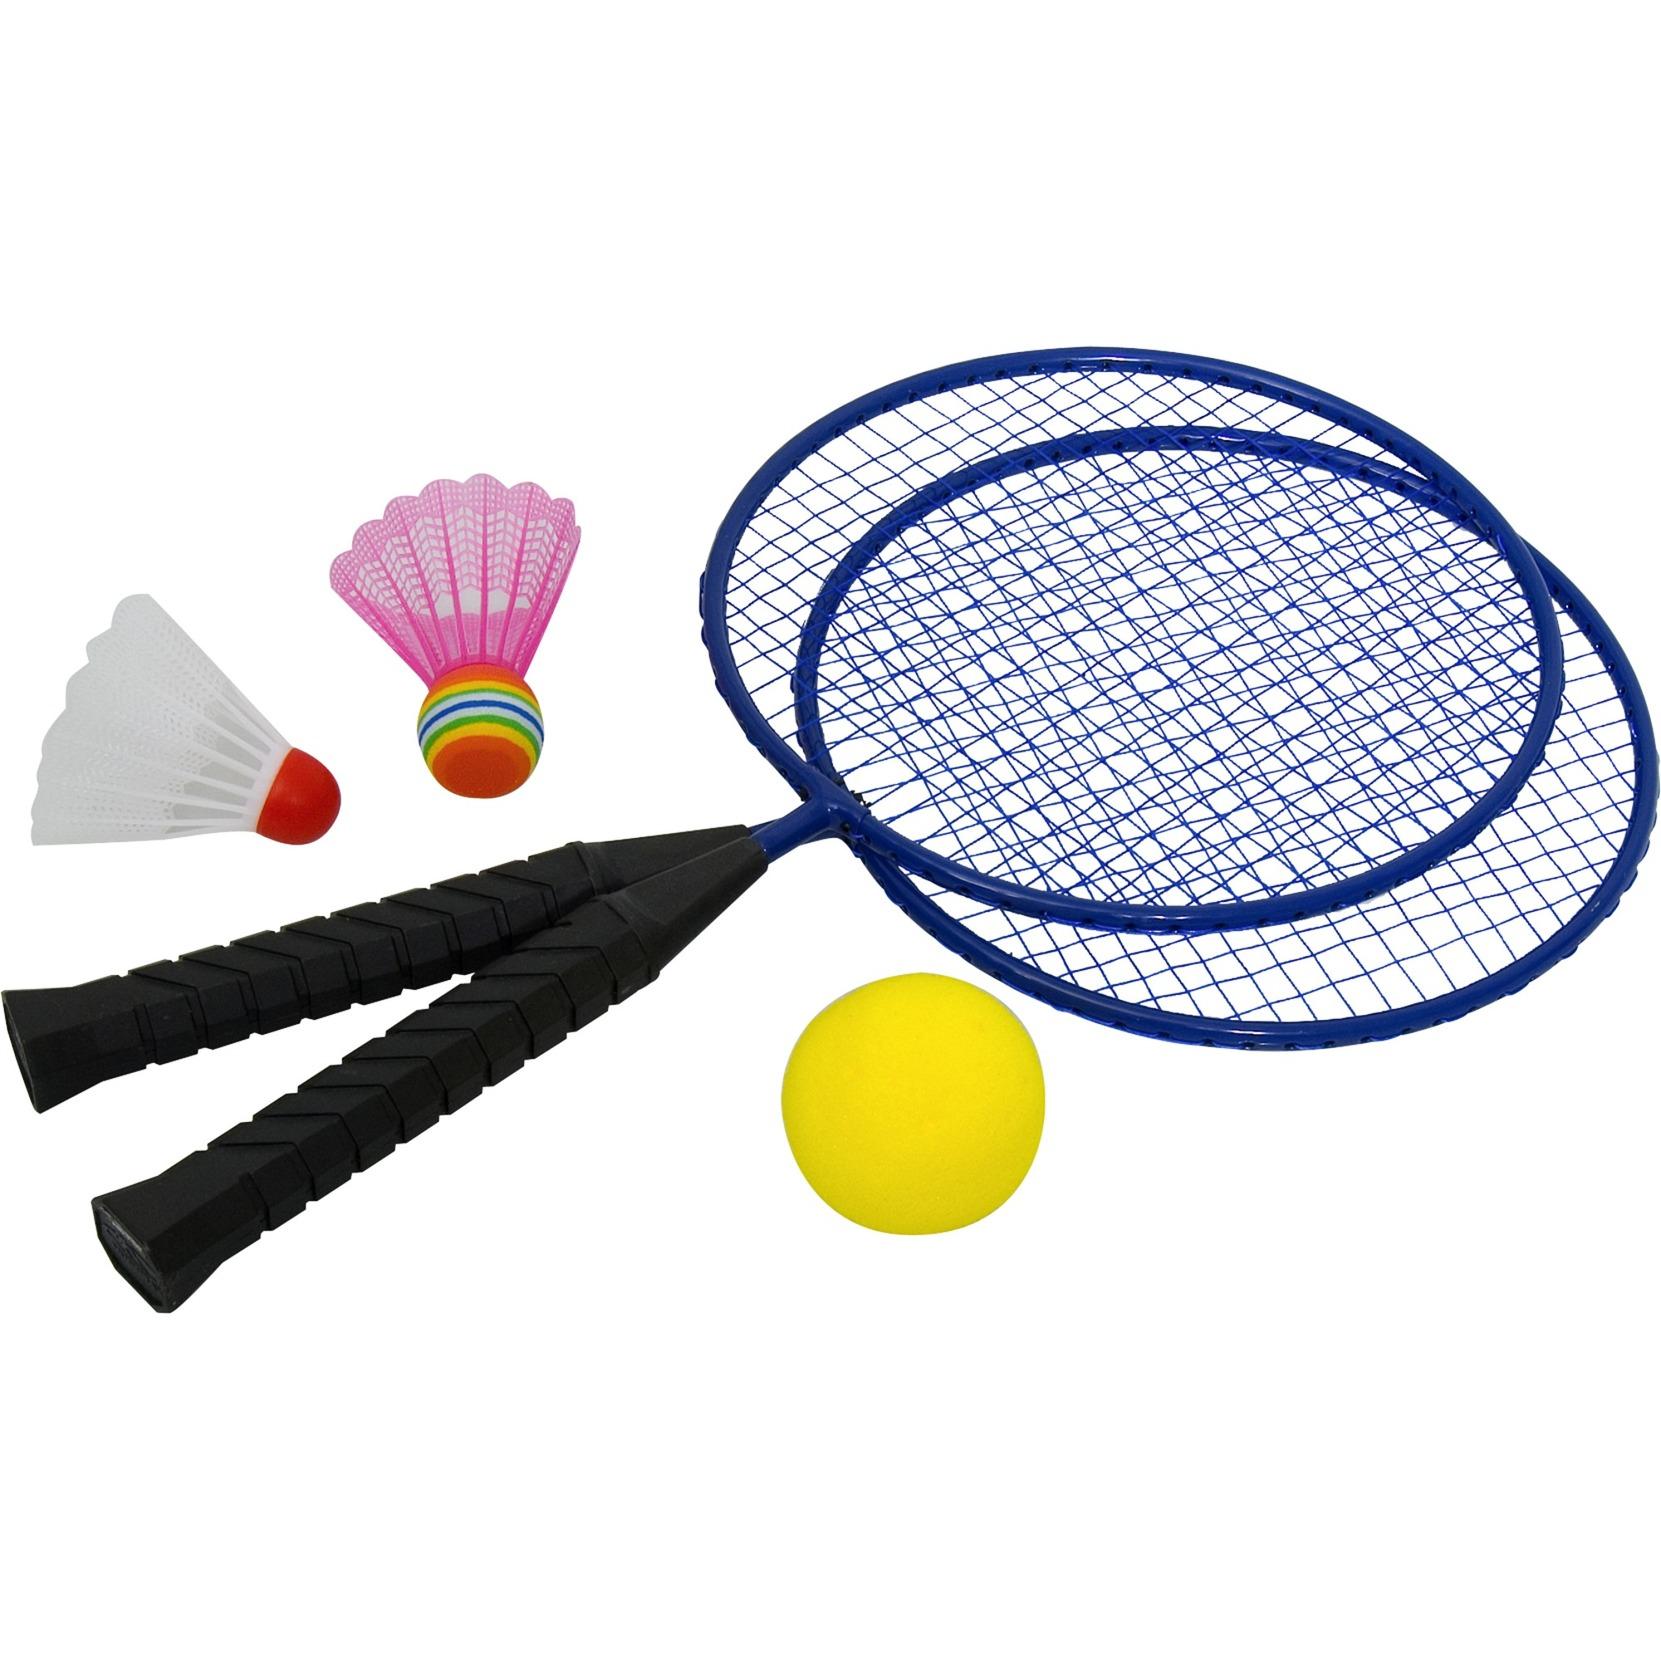 76046 Acero Negro, Azul 2pieza(s) raqueta para bádminton, Aparato para fitness